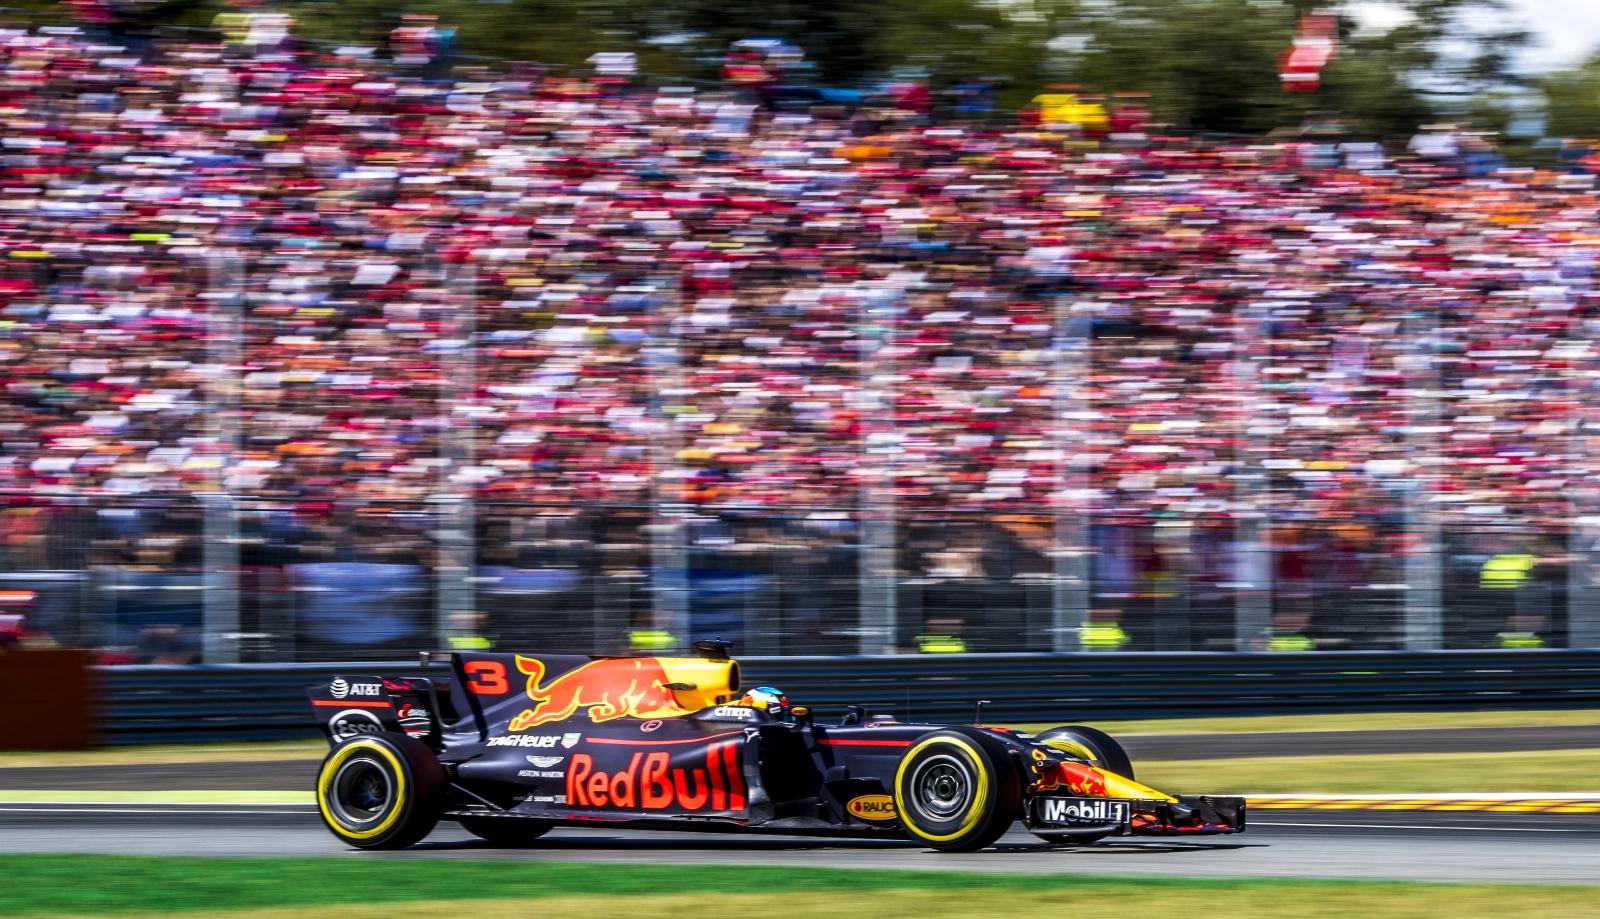 Formuła 1, Grand Prix Włoch EPA/SRDJAN SUKI